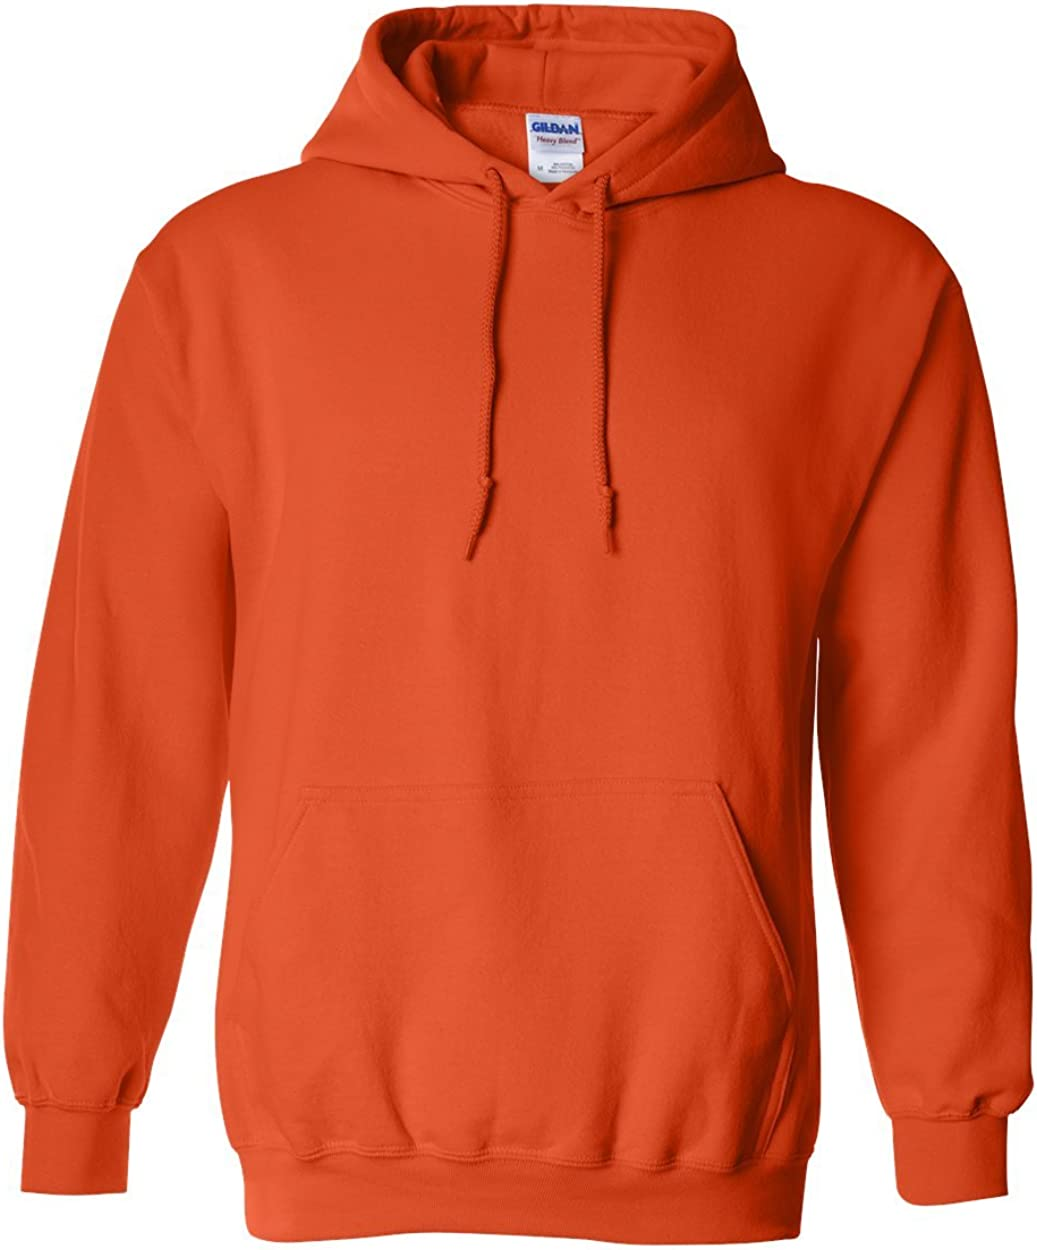 Gildan Mens Heavy Blend Fleece Hooded Sweatshirt G18500